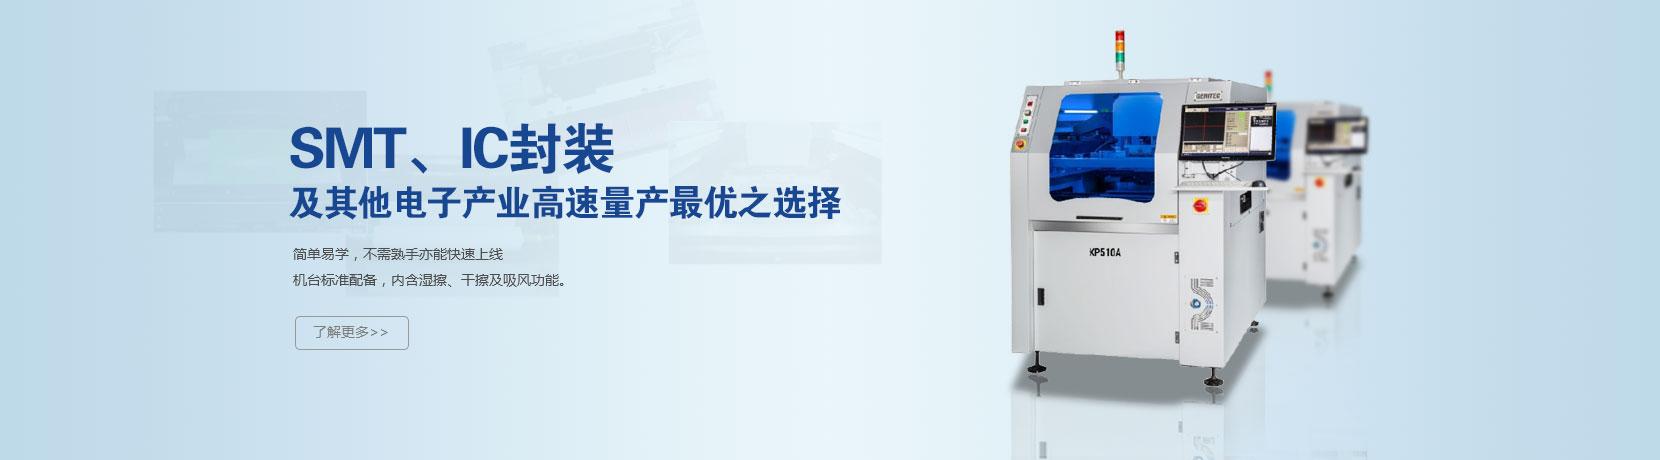 智茂全自动PCB分板机厂家网站首页banner4